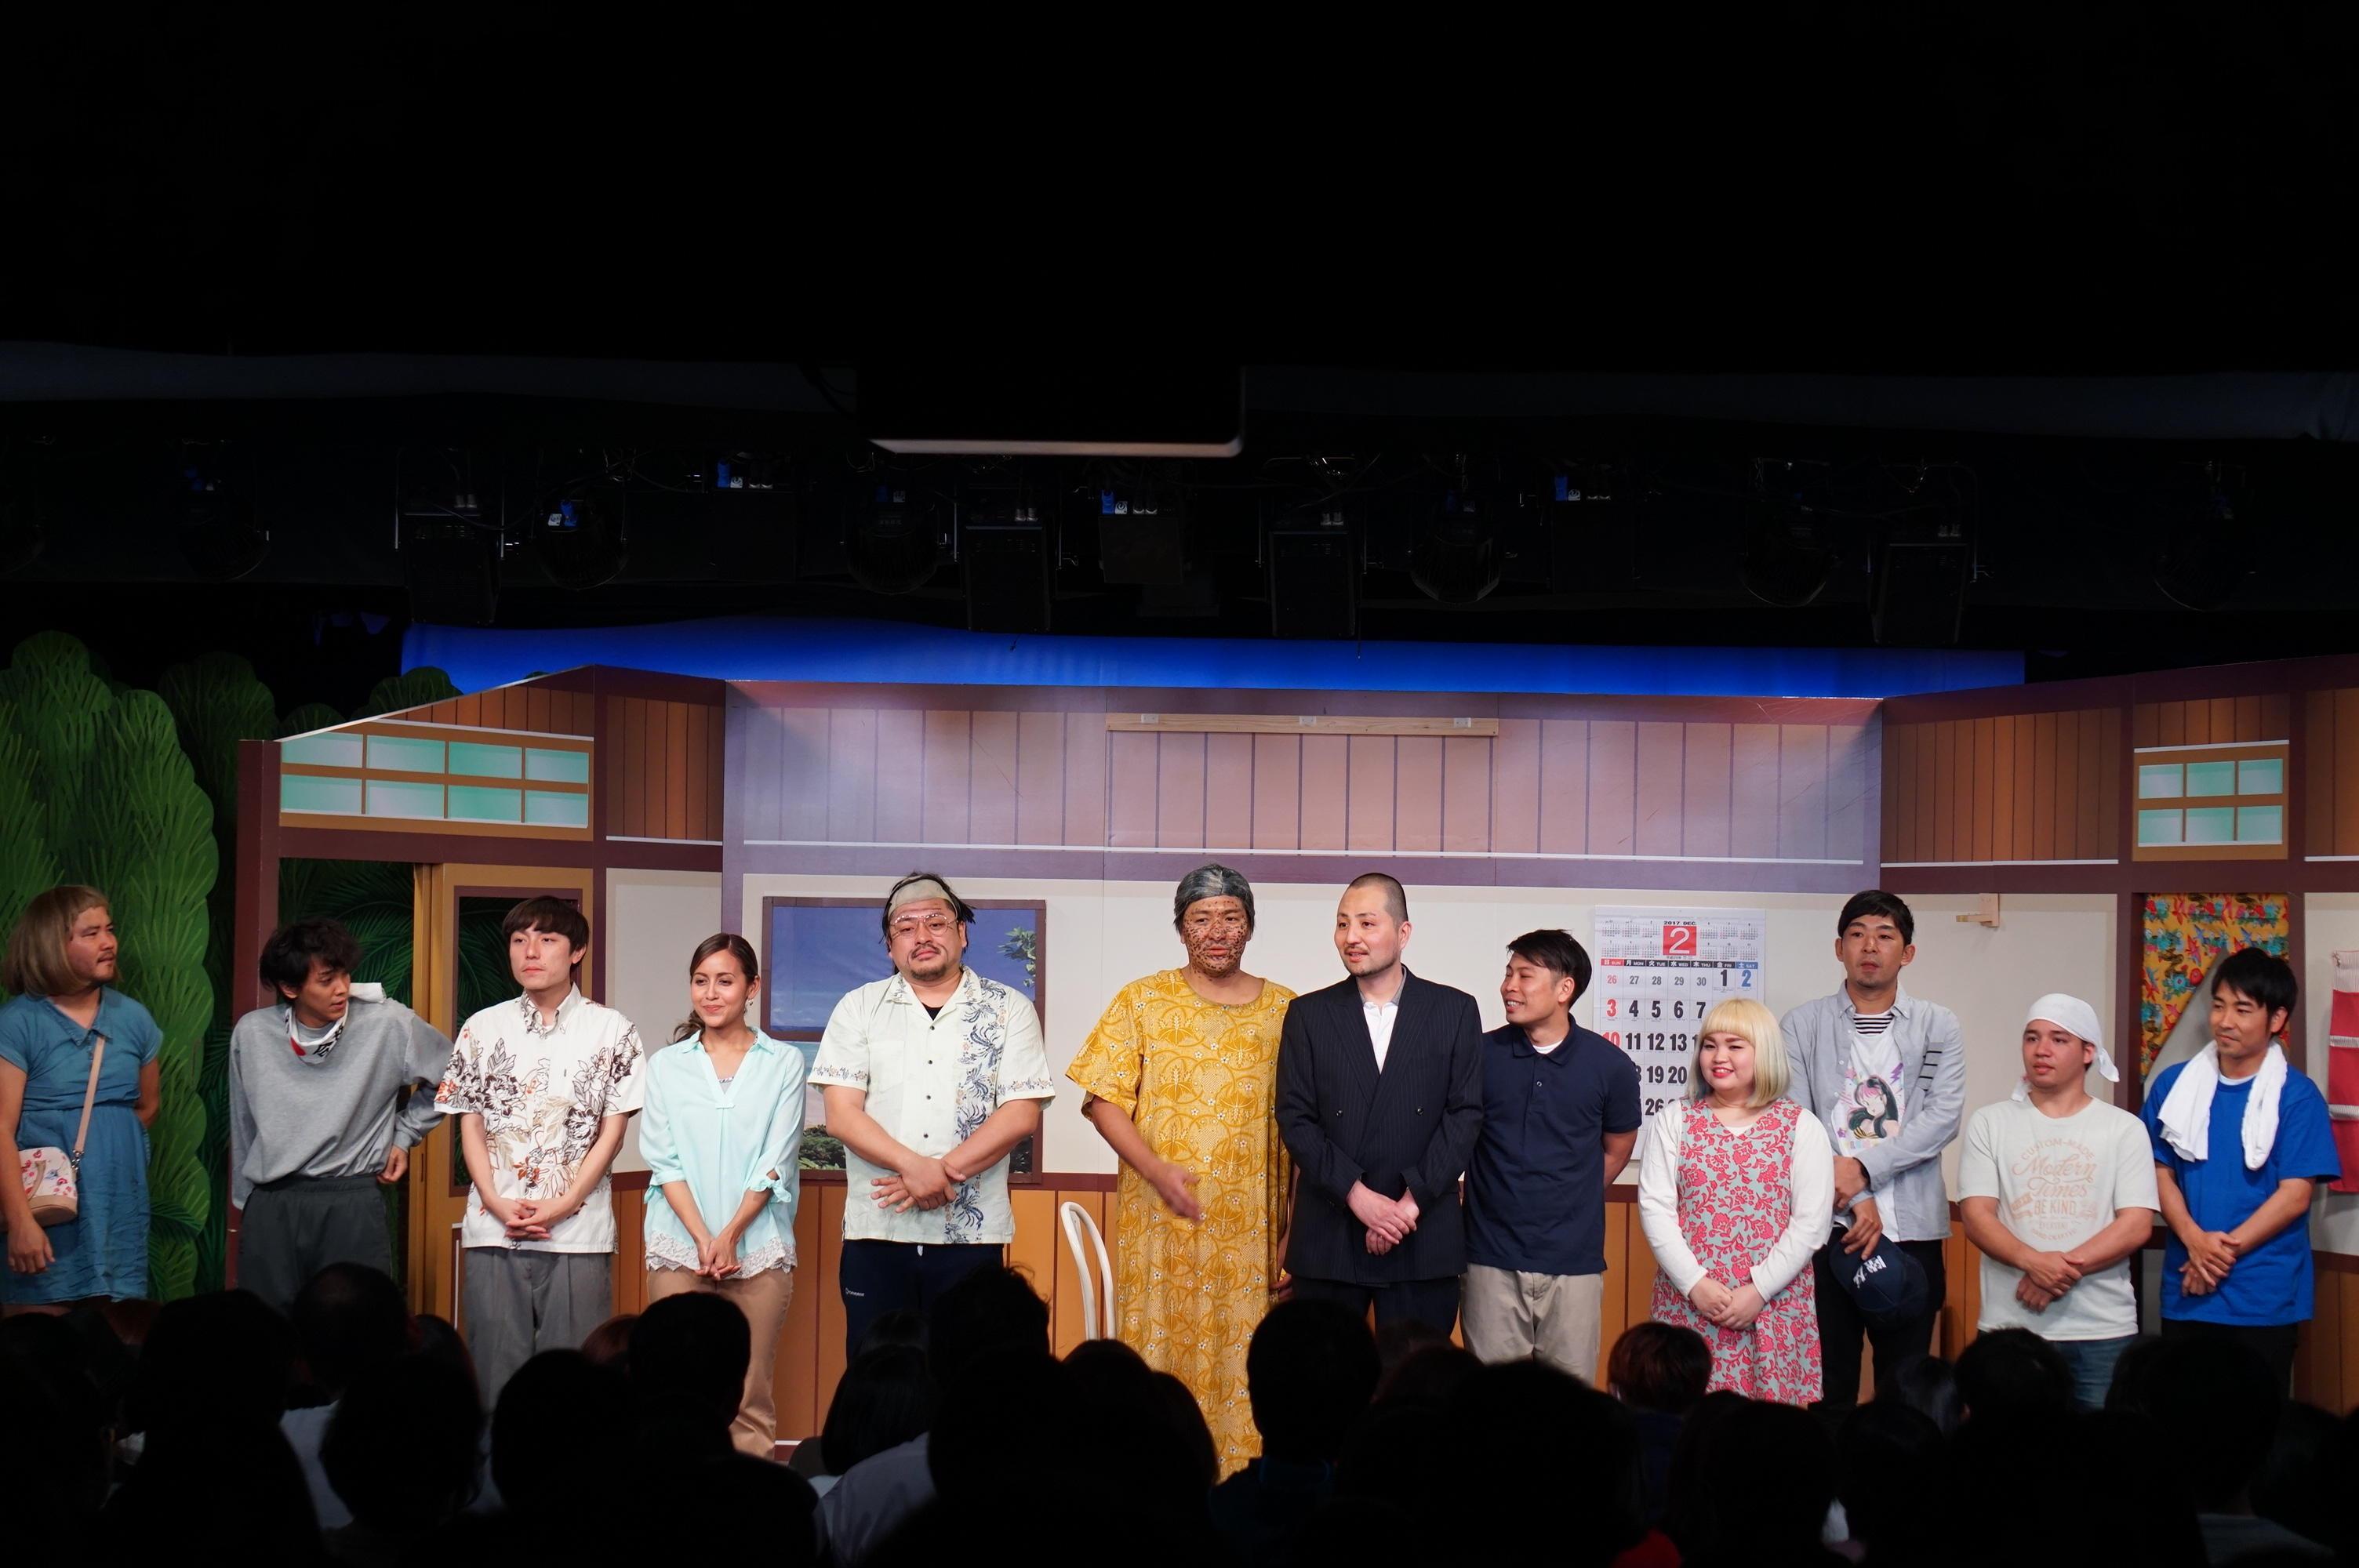 http://news.yoshimoto.co.jp/20170314202056-6f906c964e753ff9dc449777029d0379cd149b35.jpg